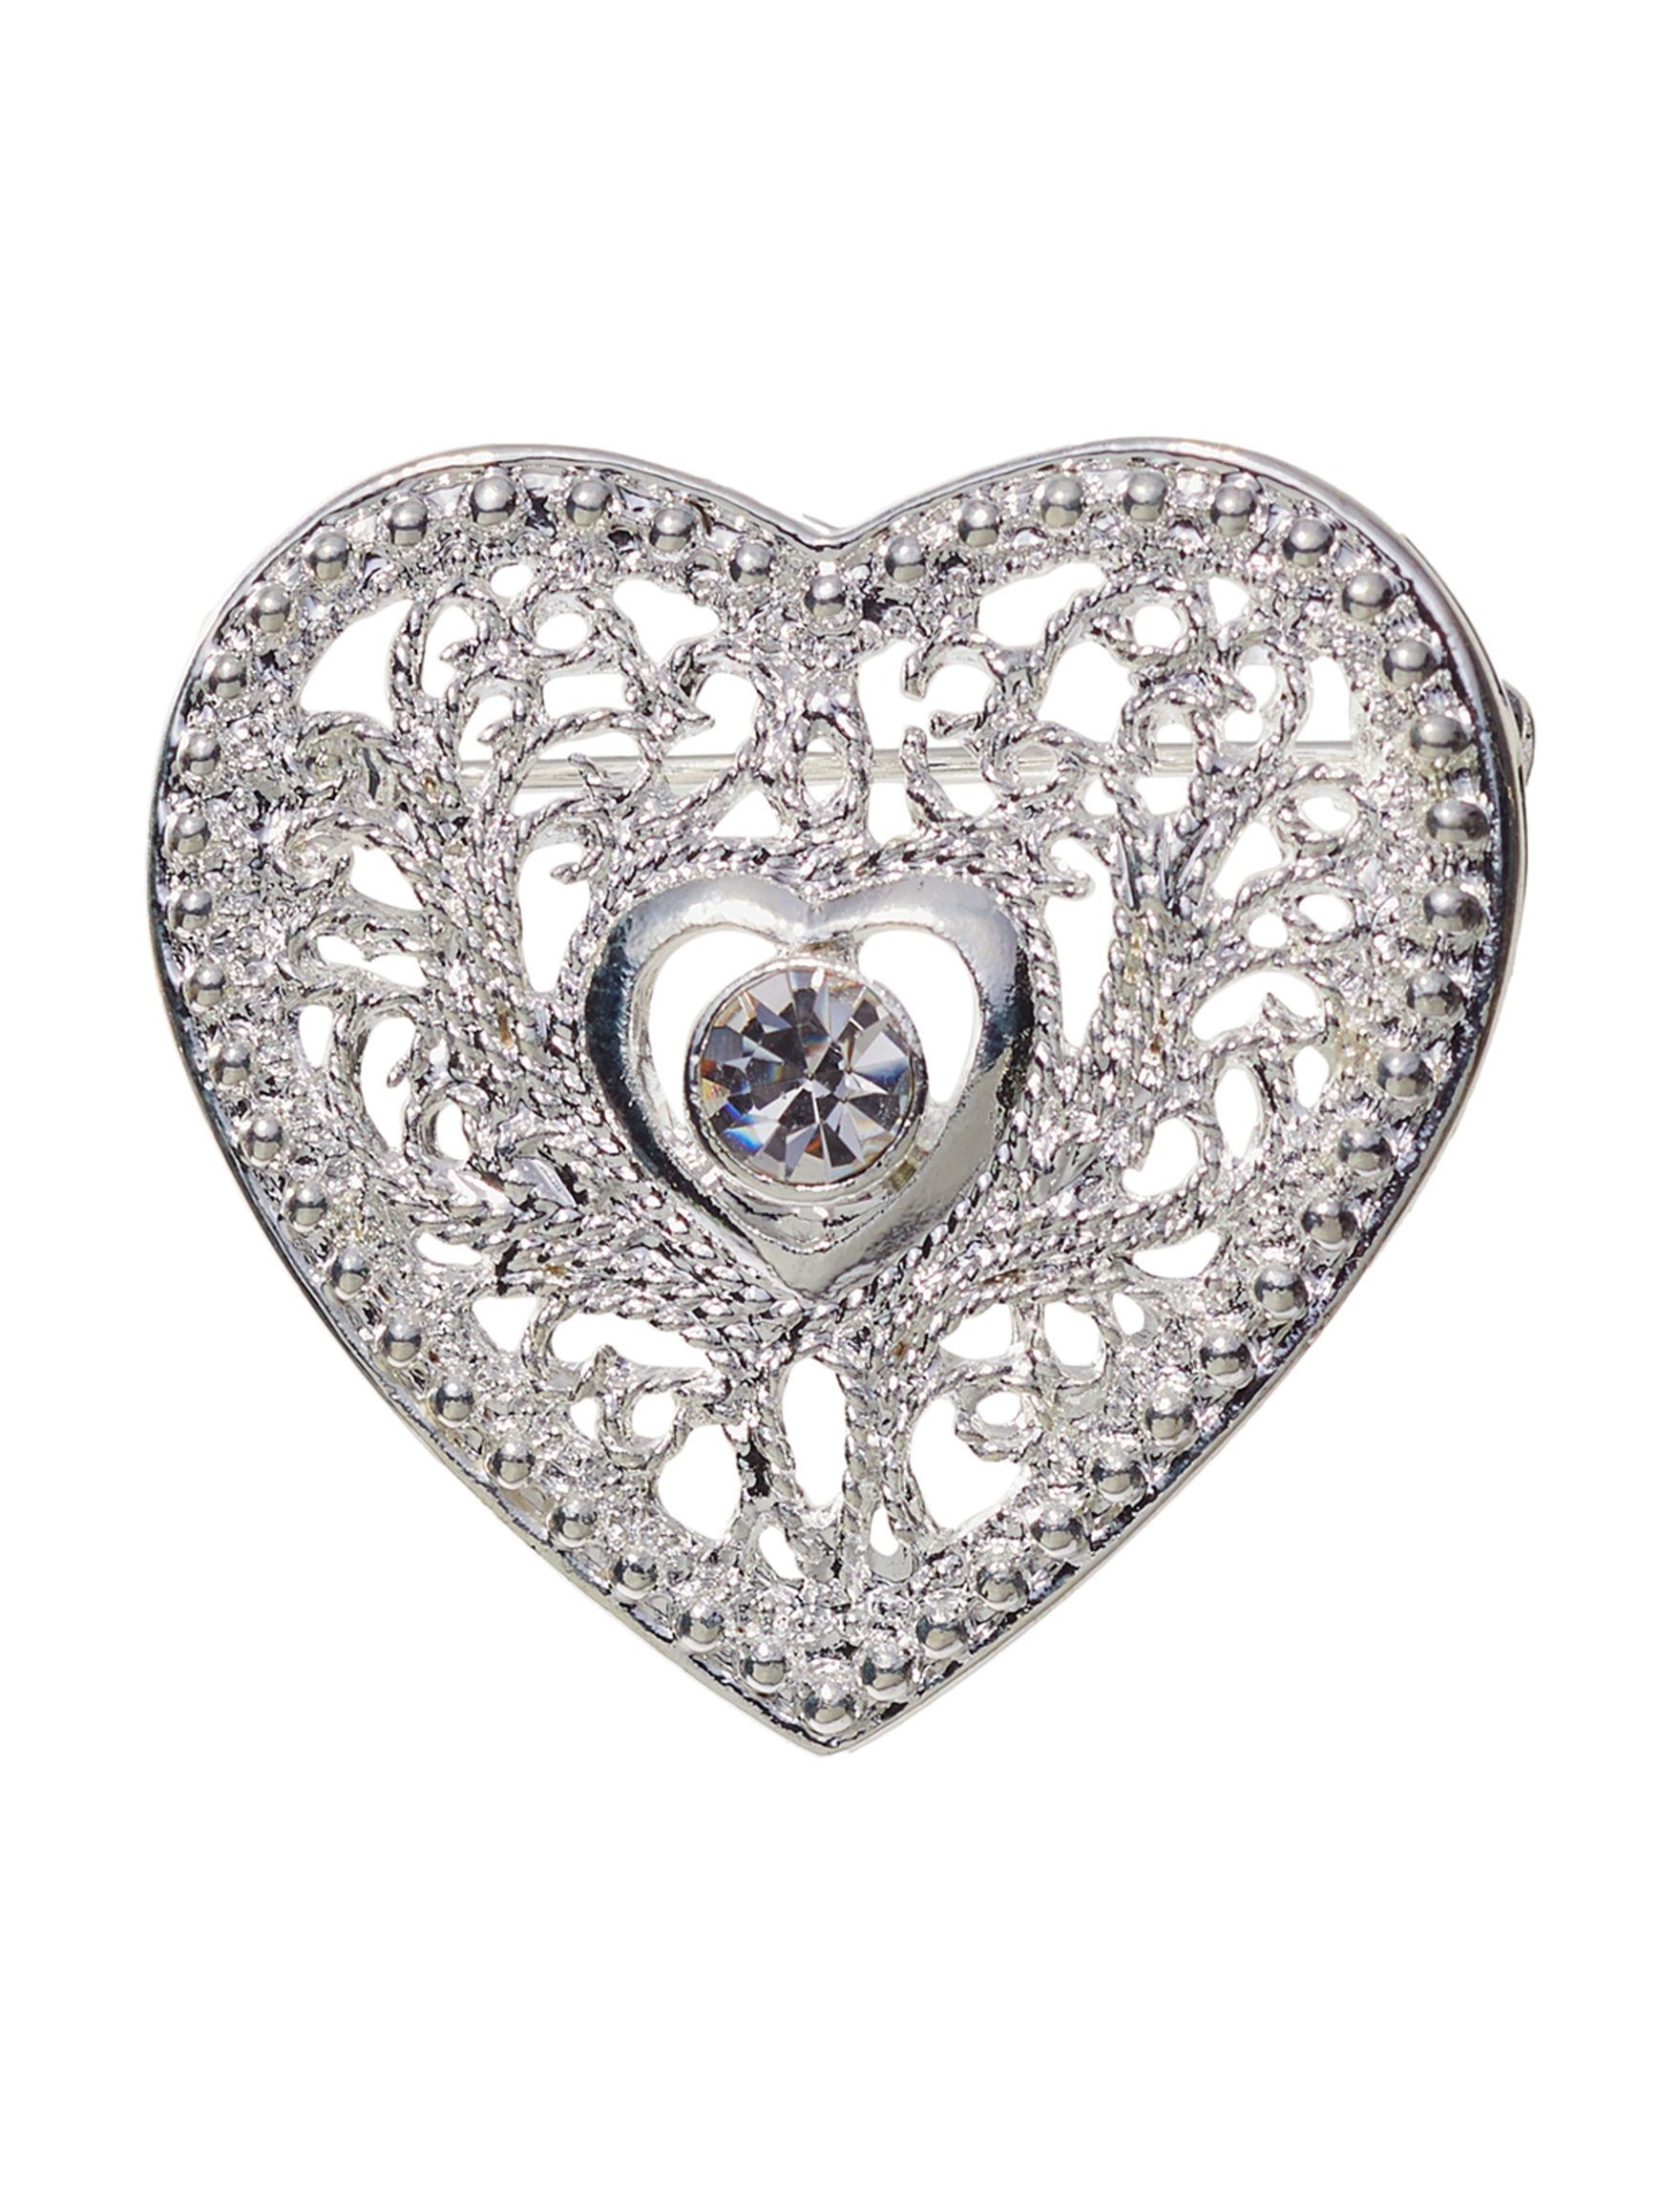 Hannah Silver Pins Fashion Jewelry